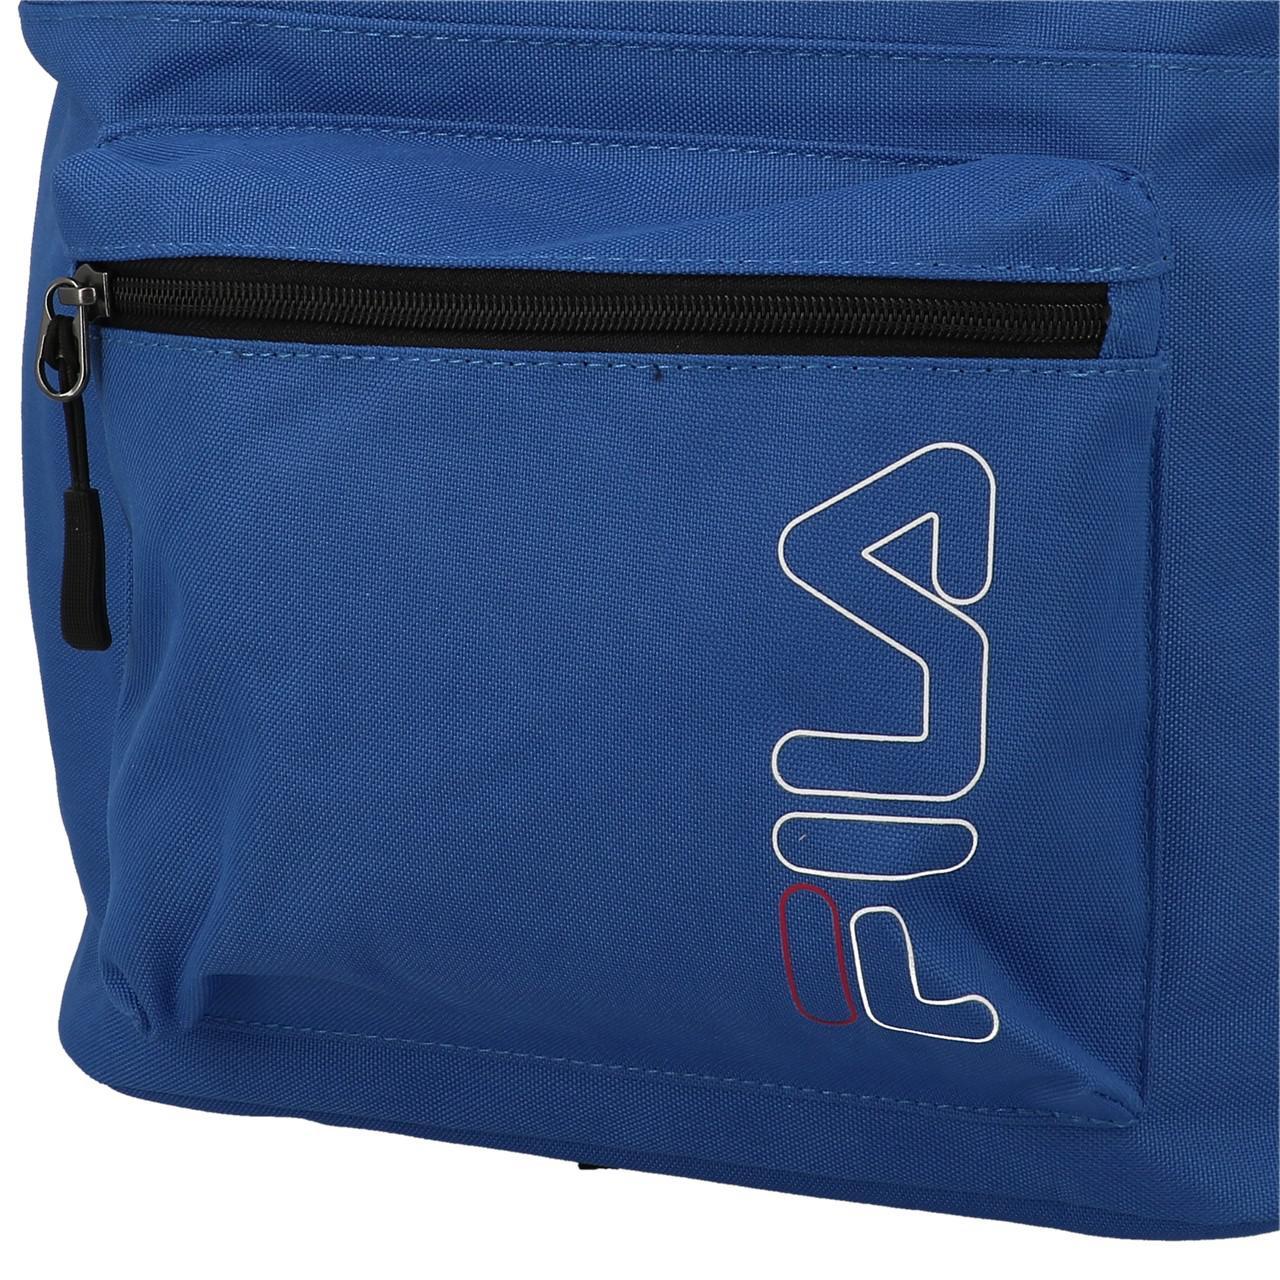 Sac-a-dos-college-Fila-Backpack-sxcool-bleu-Bleu-48131-Neuf miniature 3